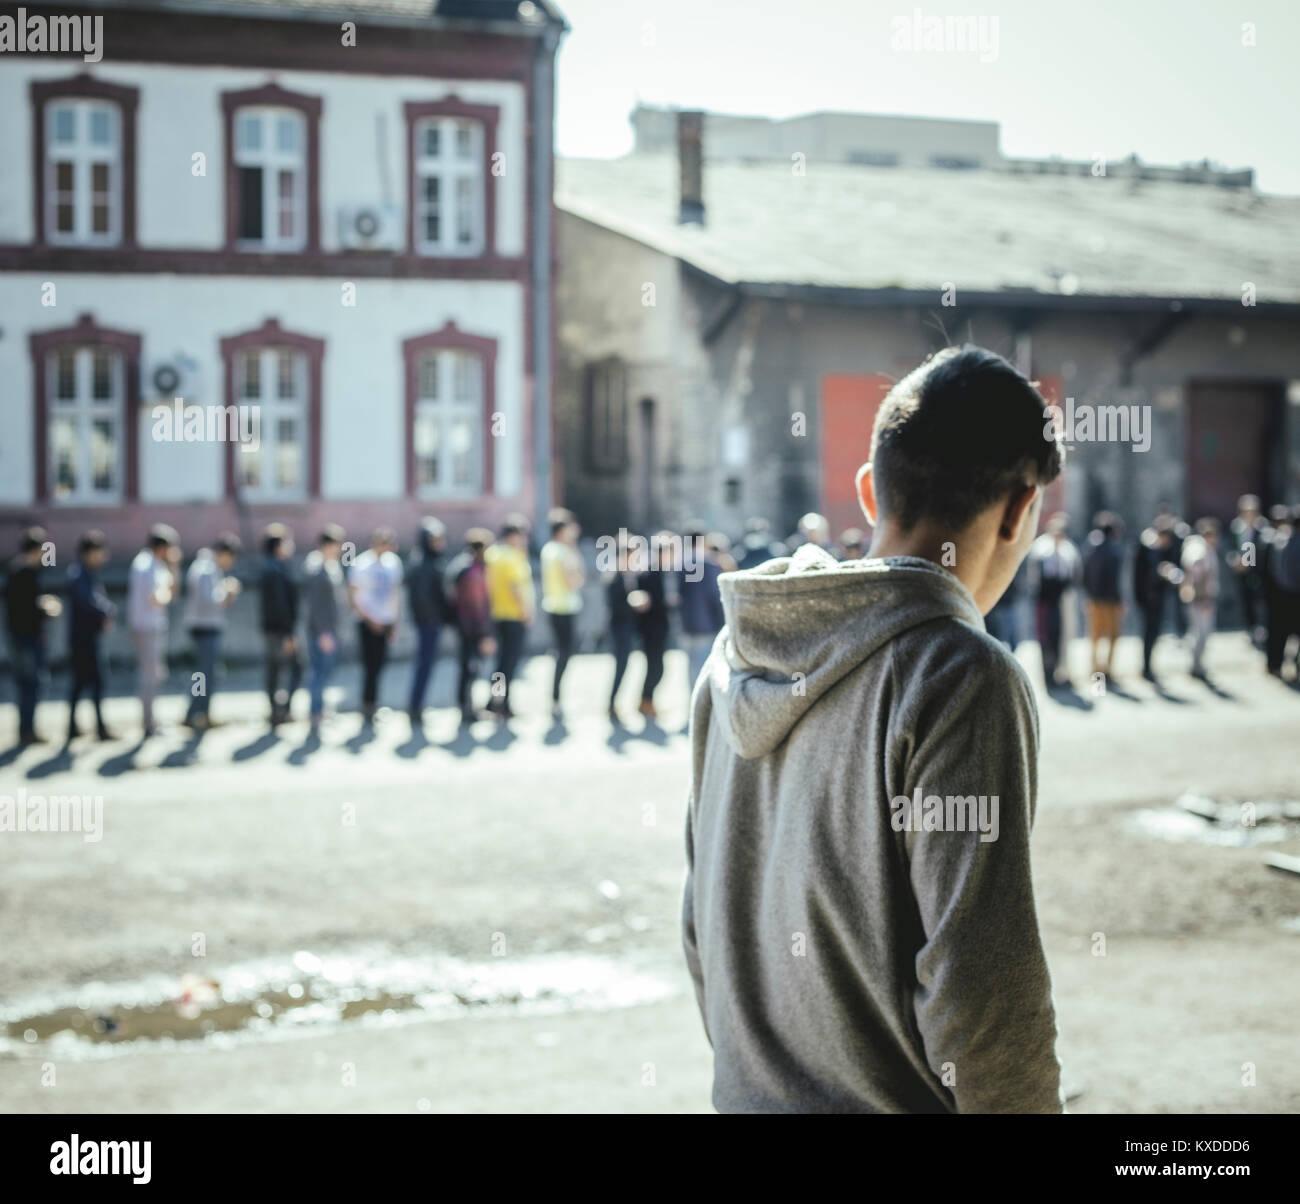 Refugees,Afghani,Pakistani youth,abandoned department store,Belgrade,Serbia - Stock Image